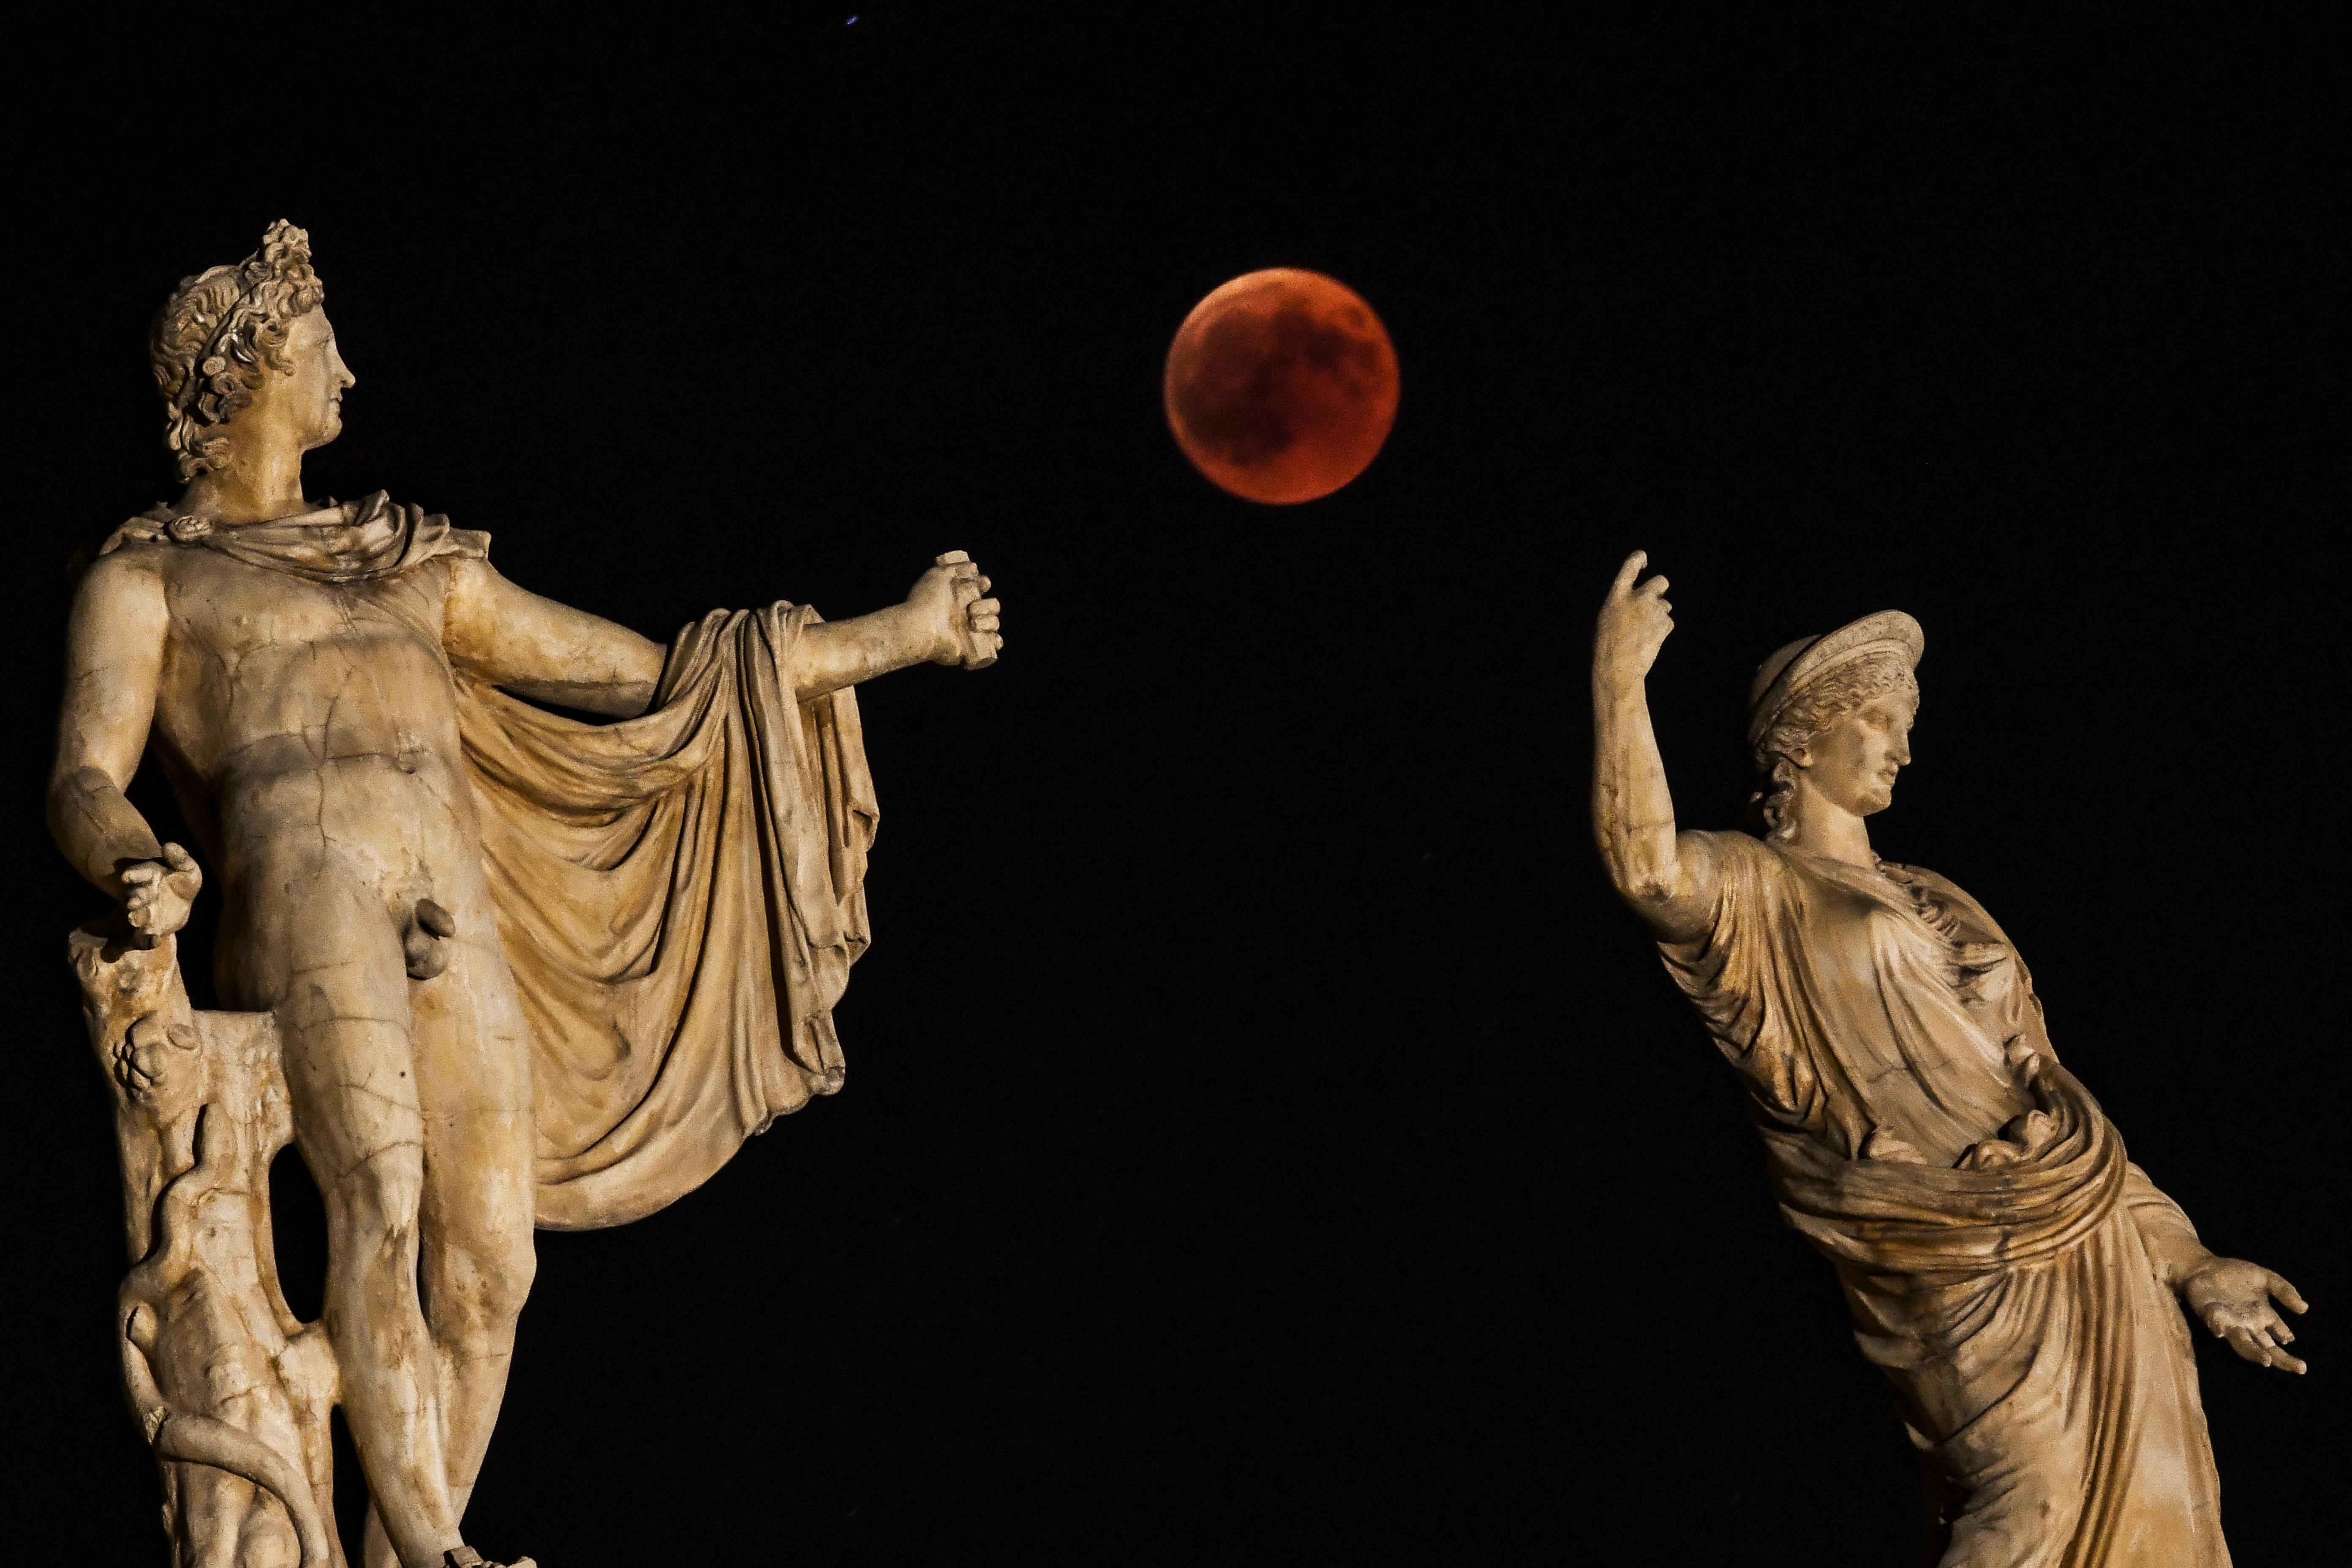 Atenas, Grecia | Aris Messinis | Agence France-Presse